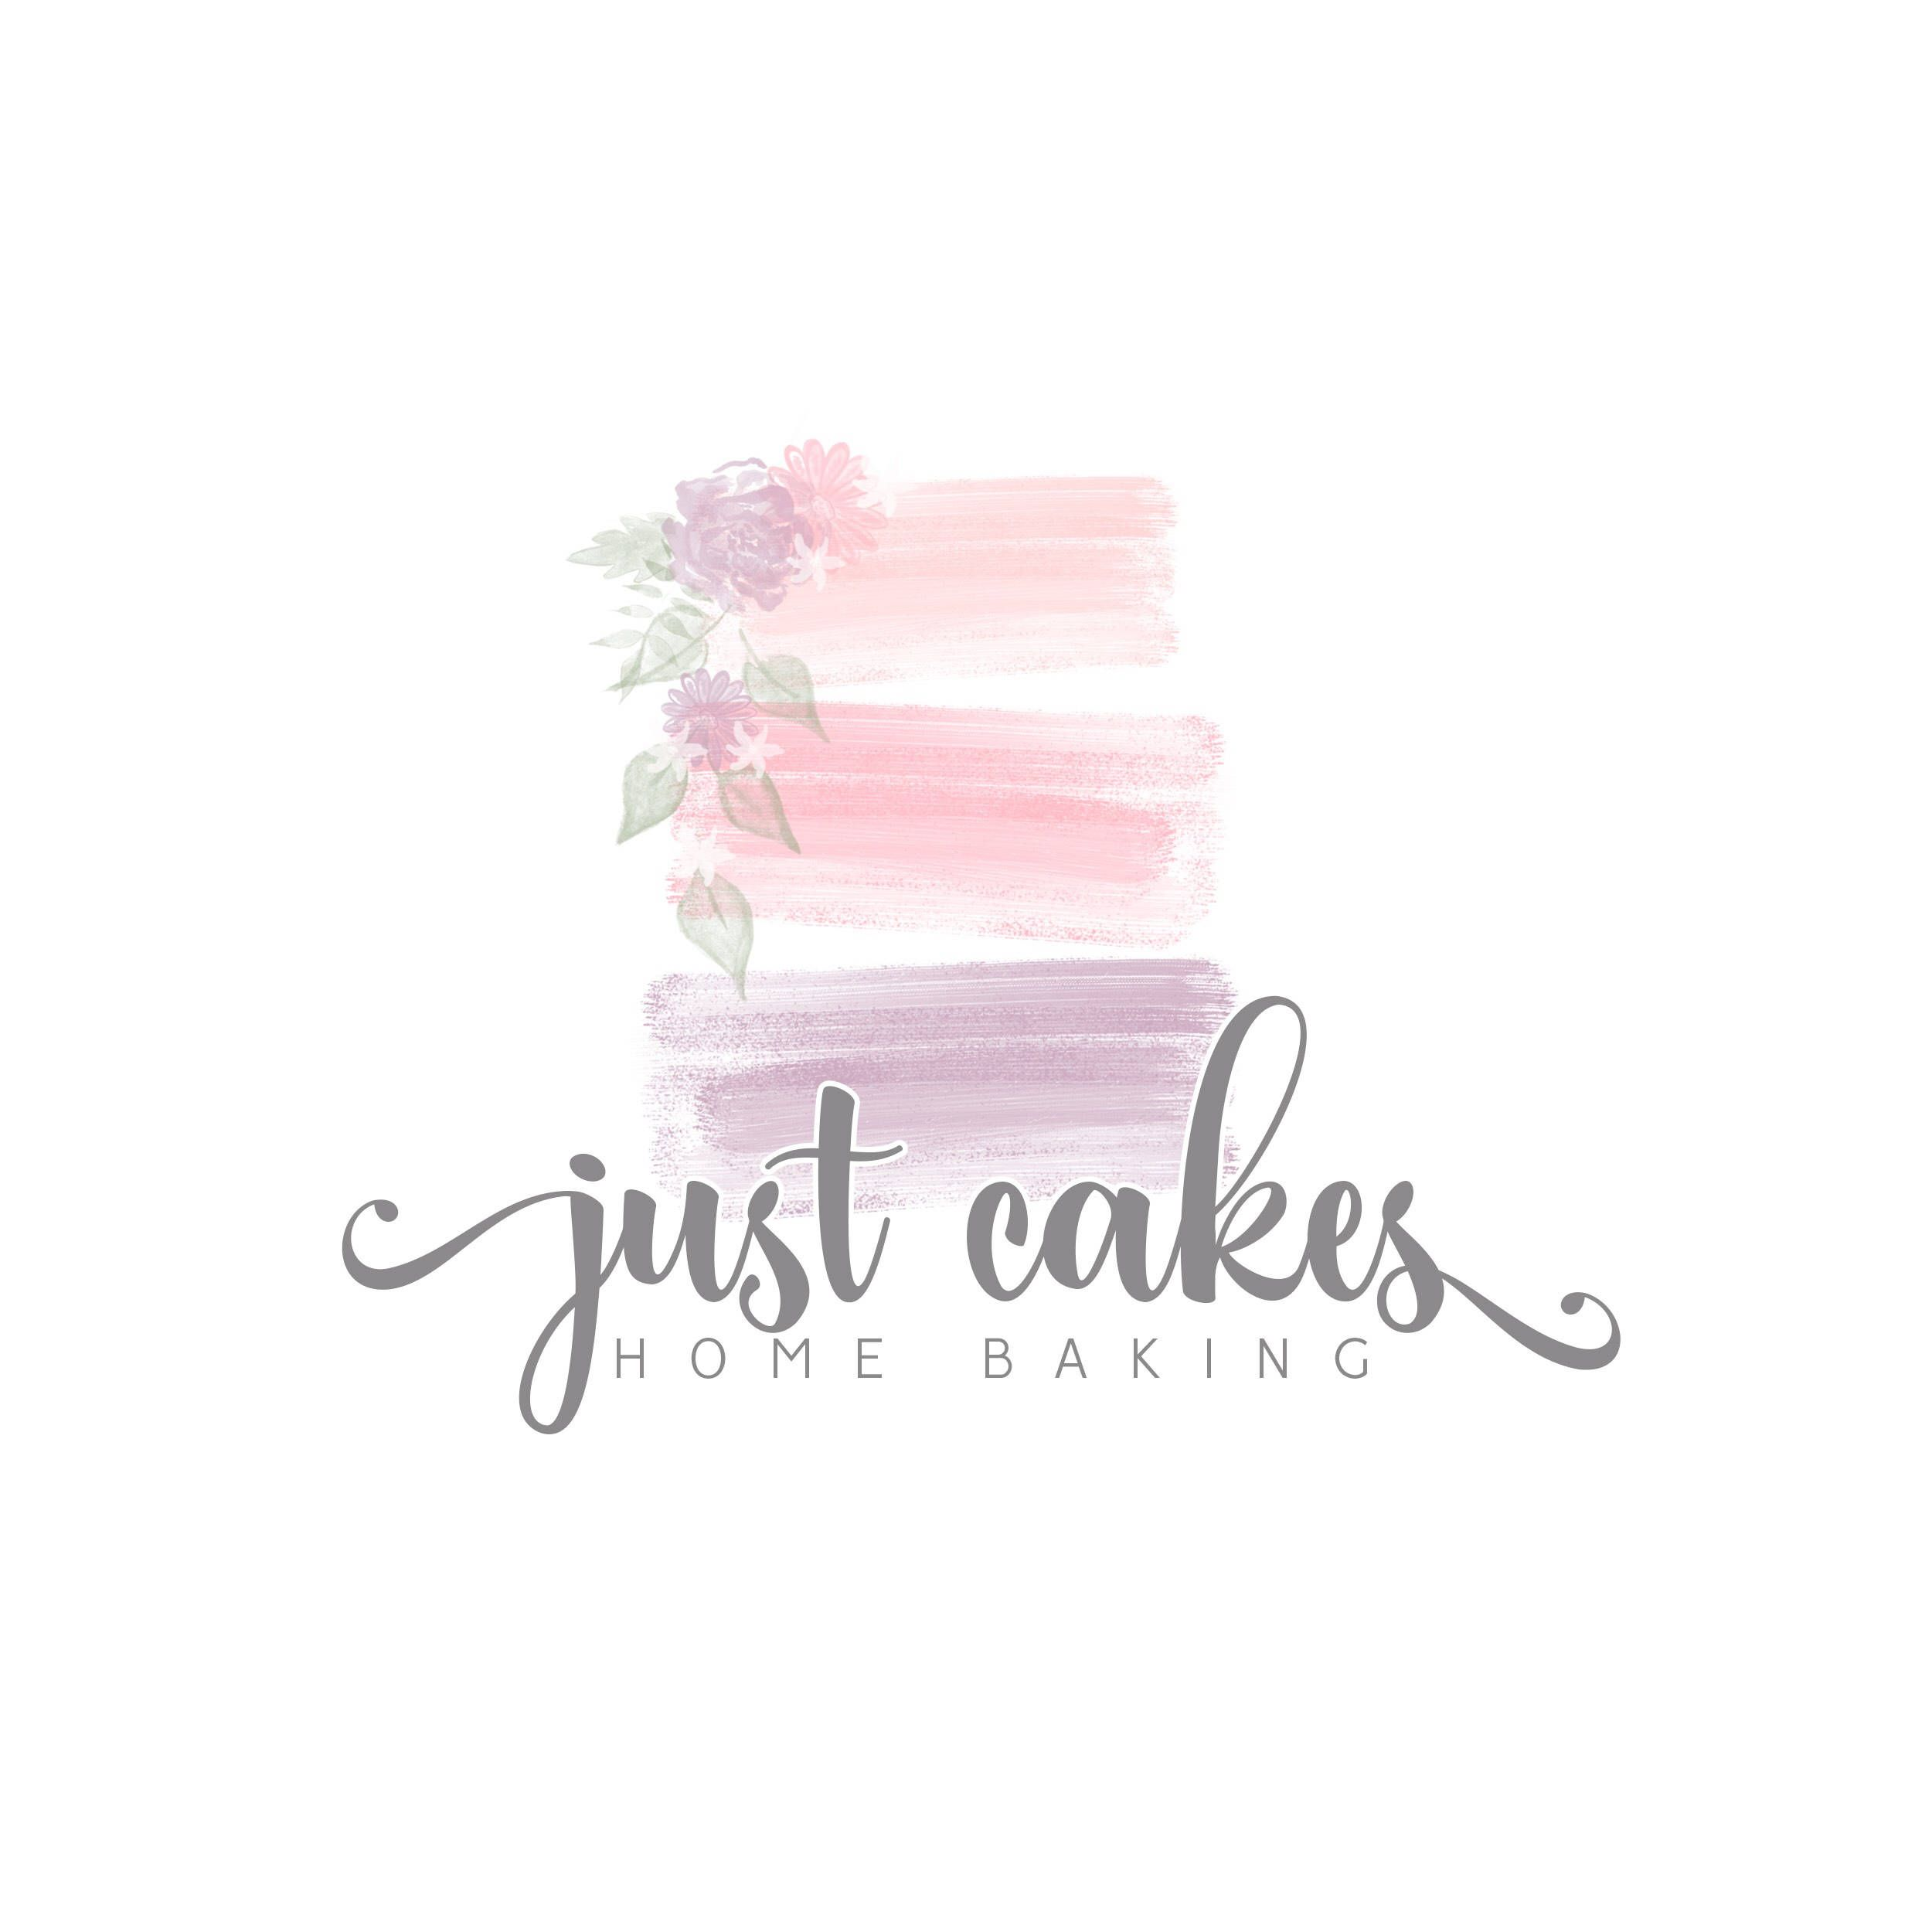 premade logo logo design watermark design bakery